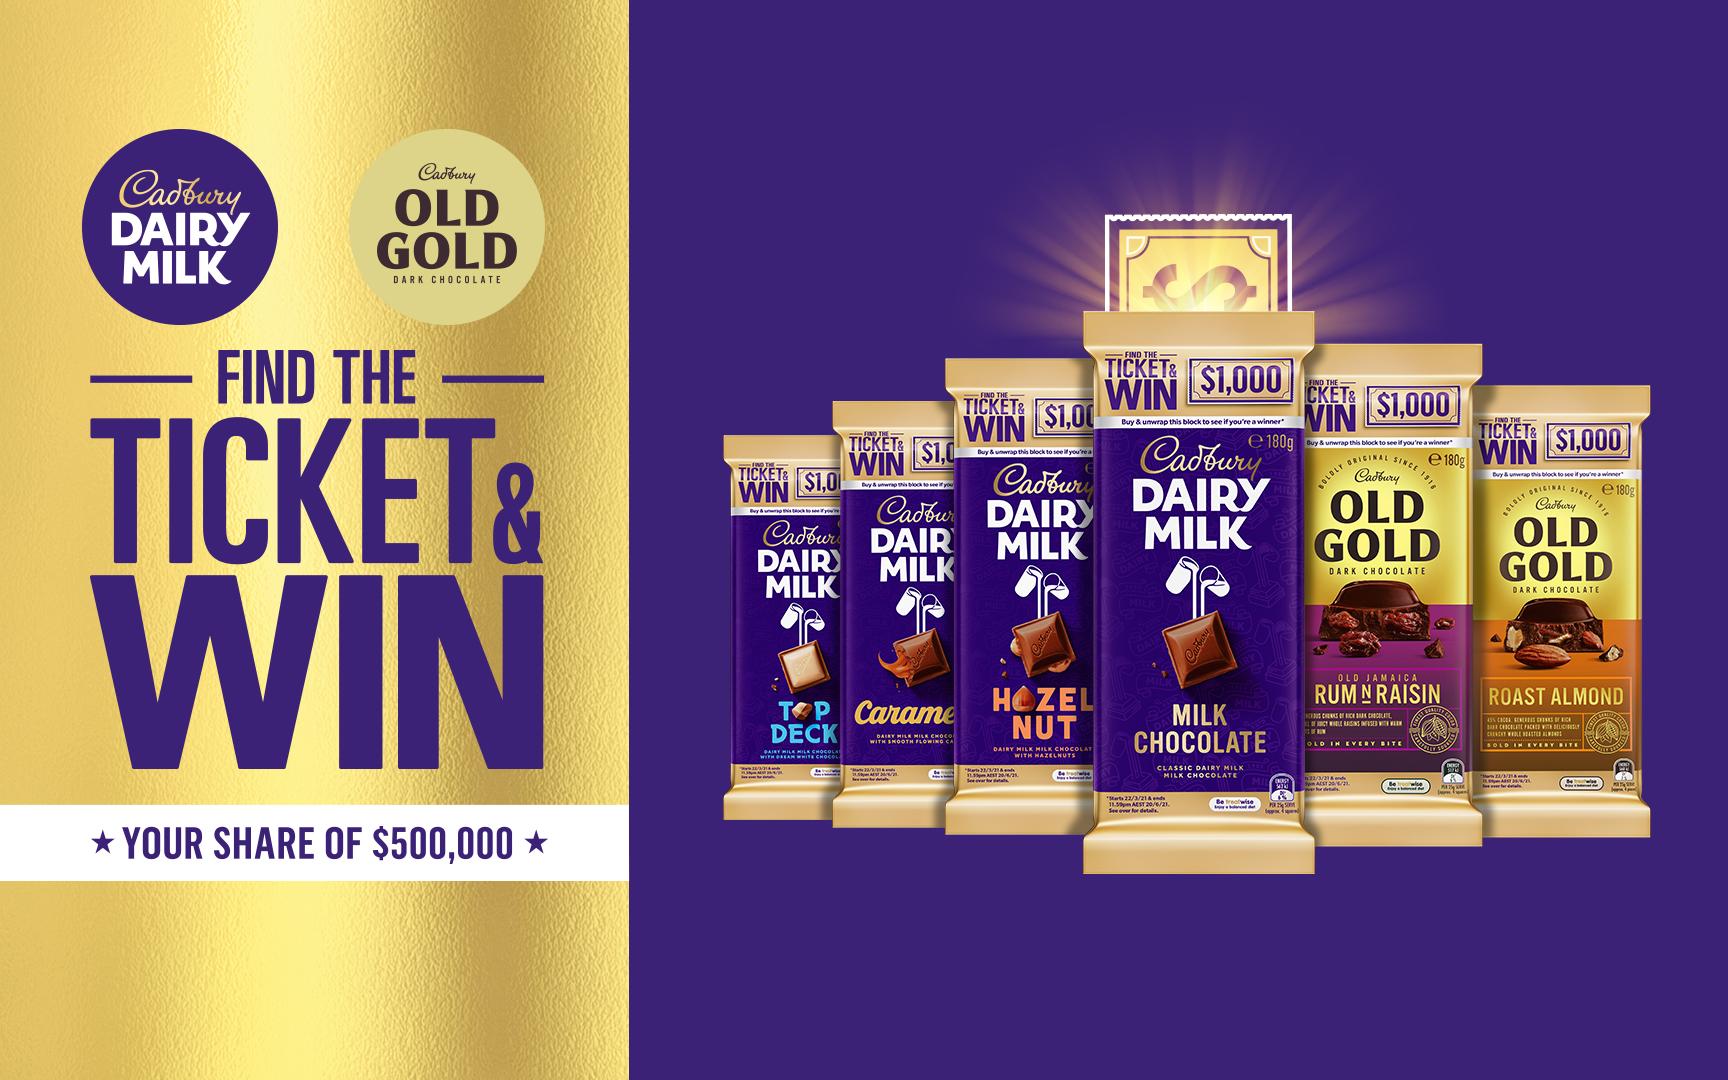 Cadbury Find the Ticket Promotion Key Visual